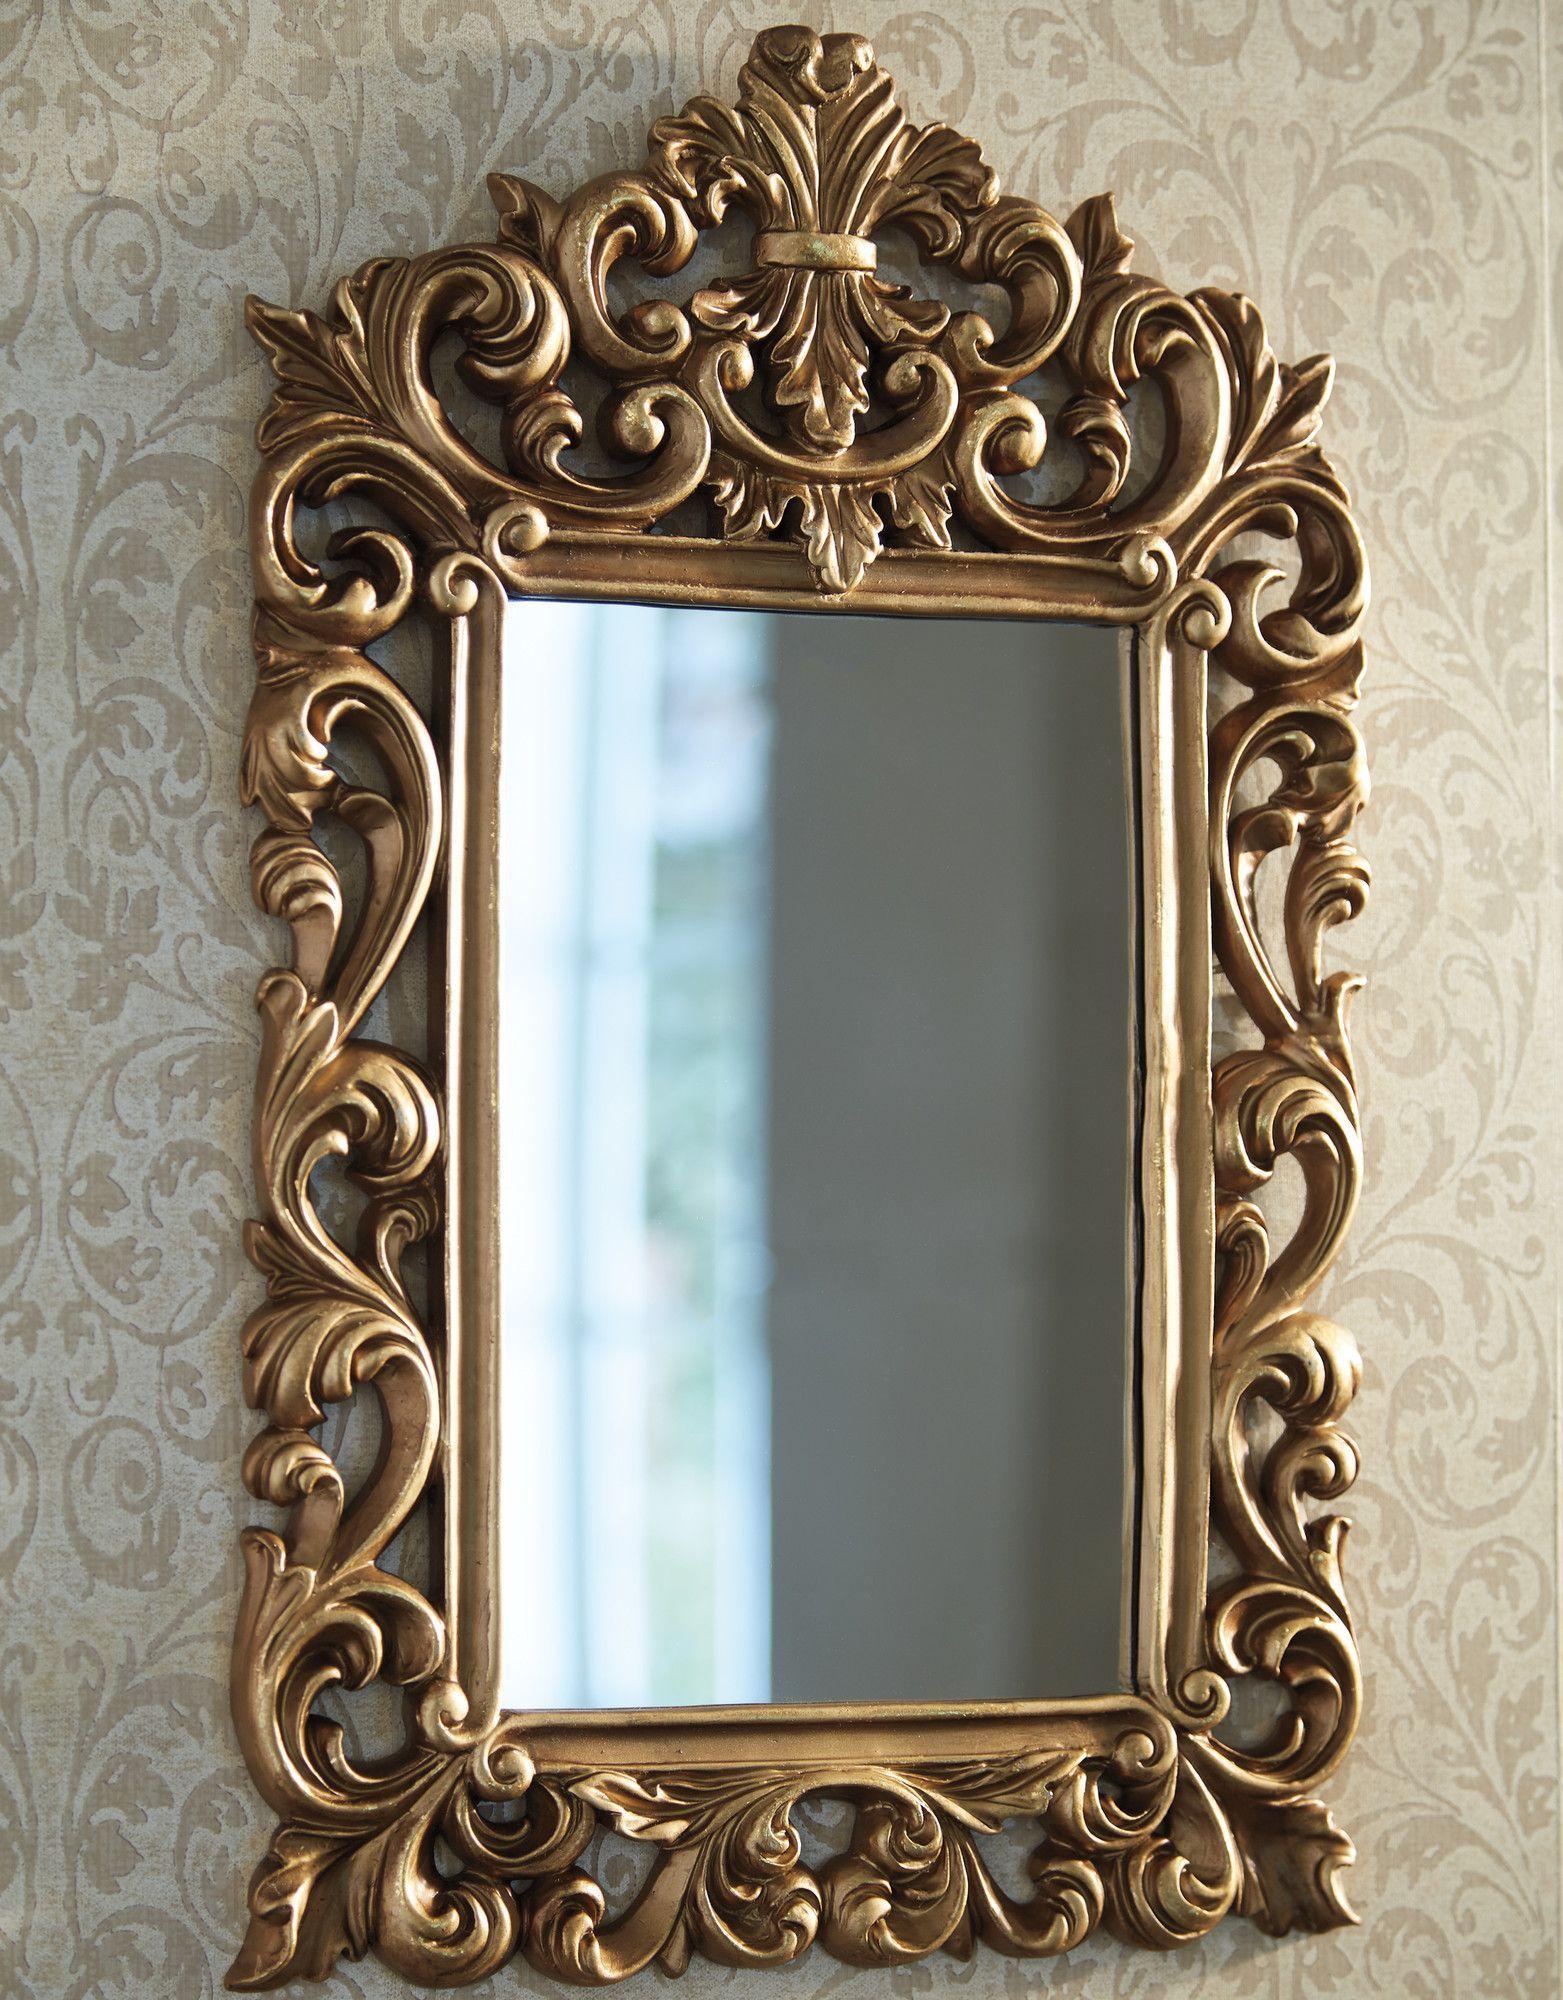 4 Eye Opening Cool Tips Framed Wall Mirror Entryway Wall Mirror With Shelf Storage Wall Mirror Pictures Wall Mirrors Entryway Antique Mirror Wall Mirror Wall